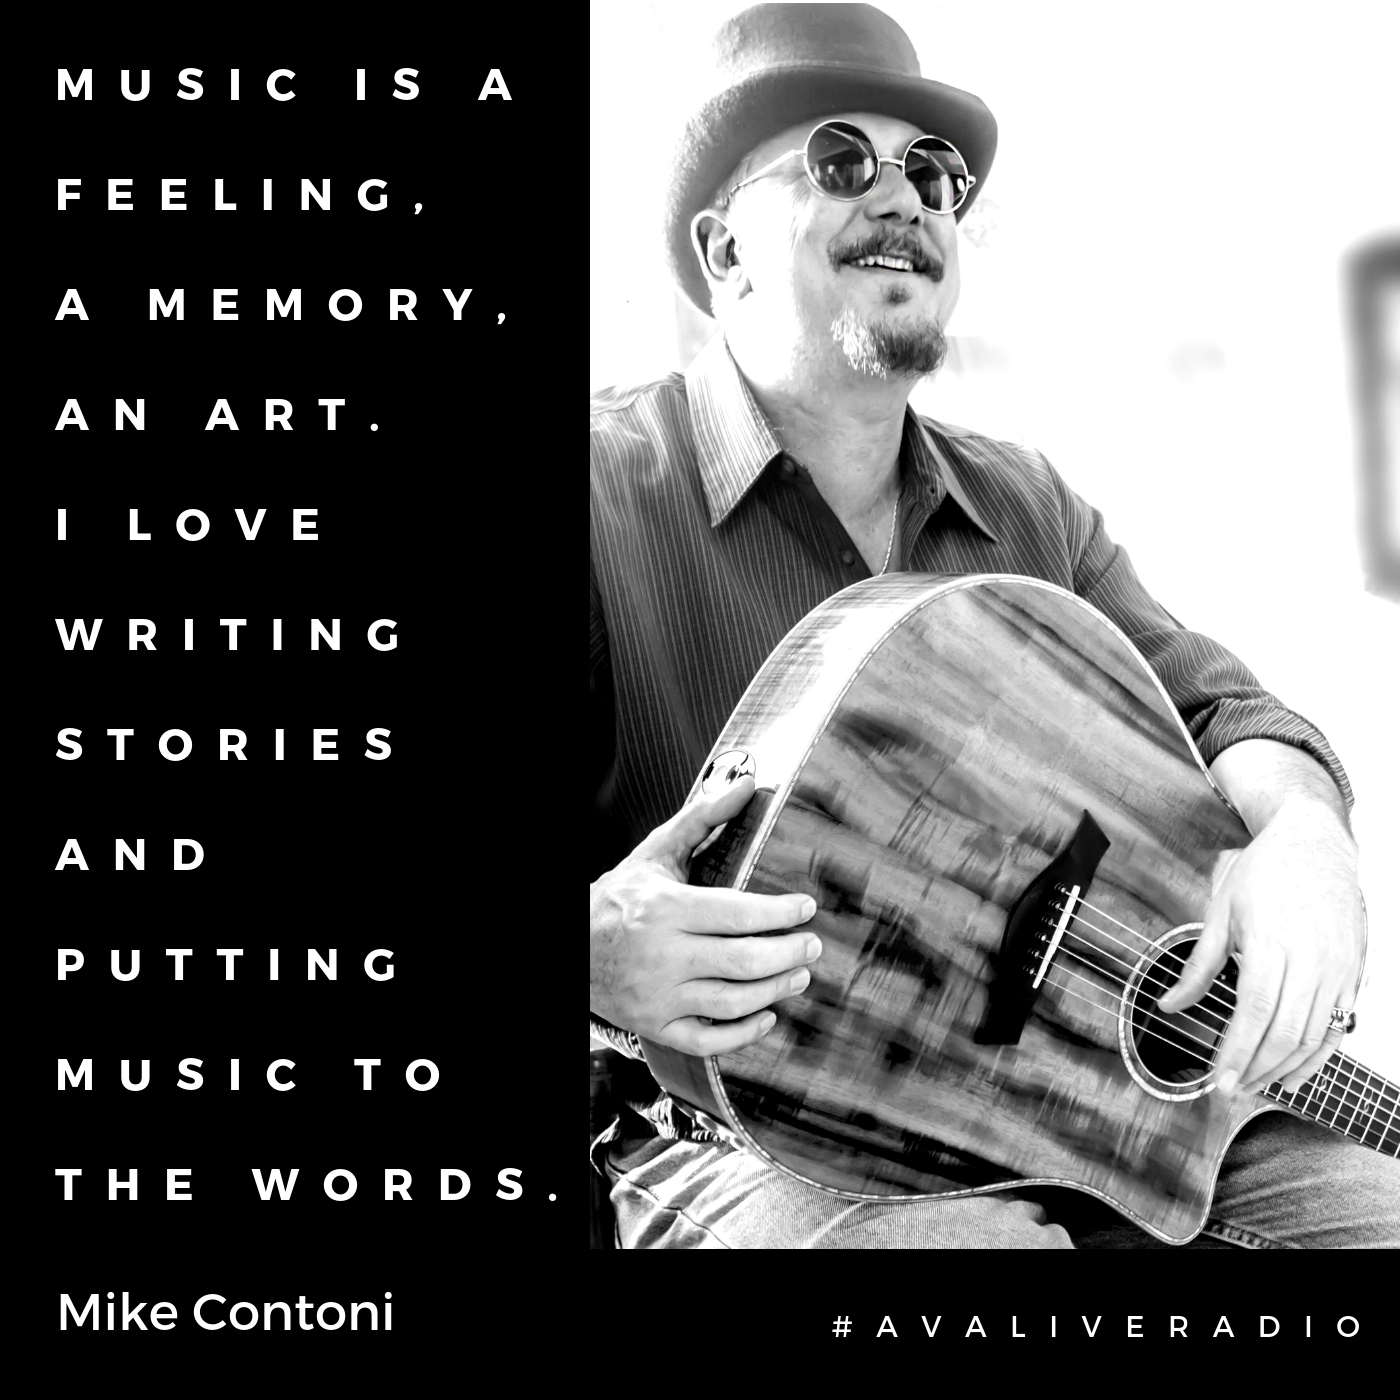 Mike Contoni avaliveradio music quote.png